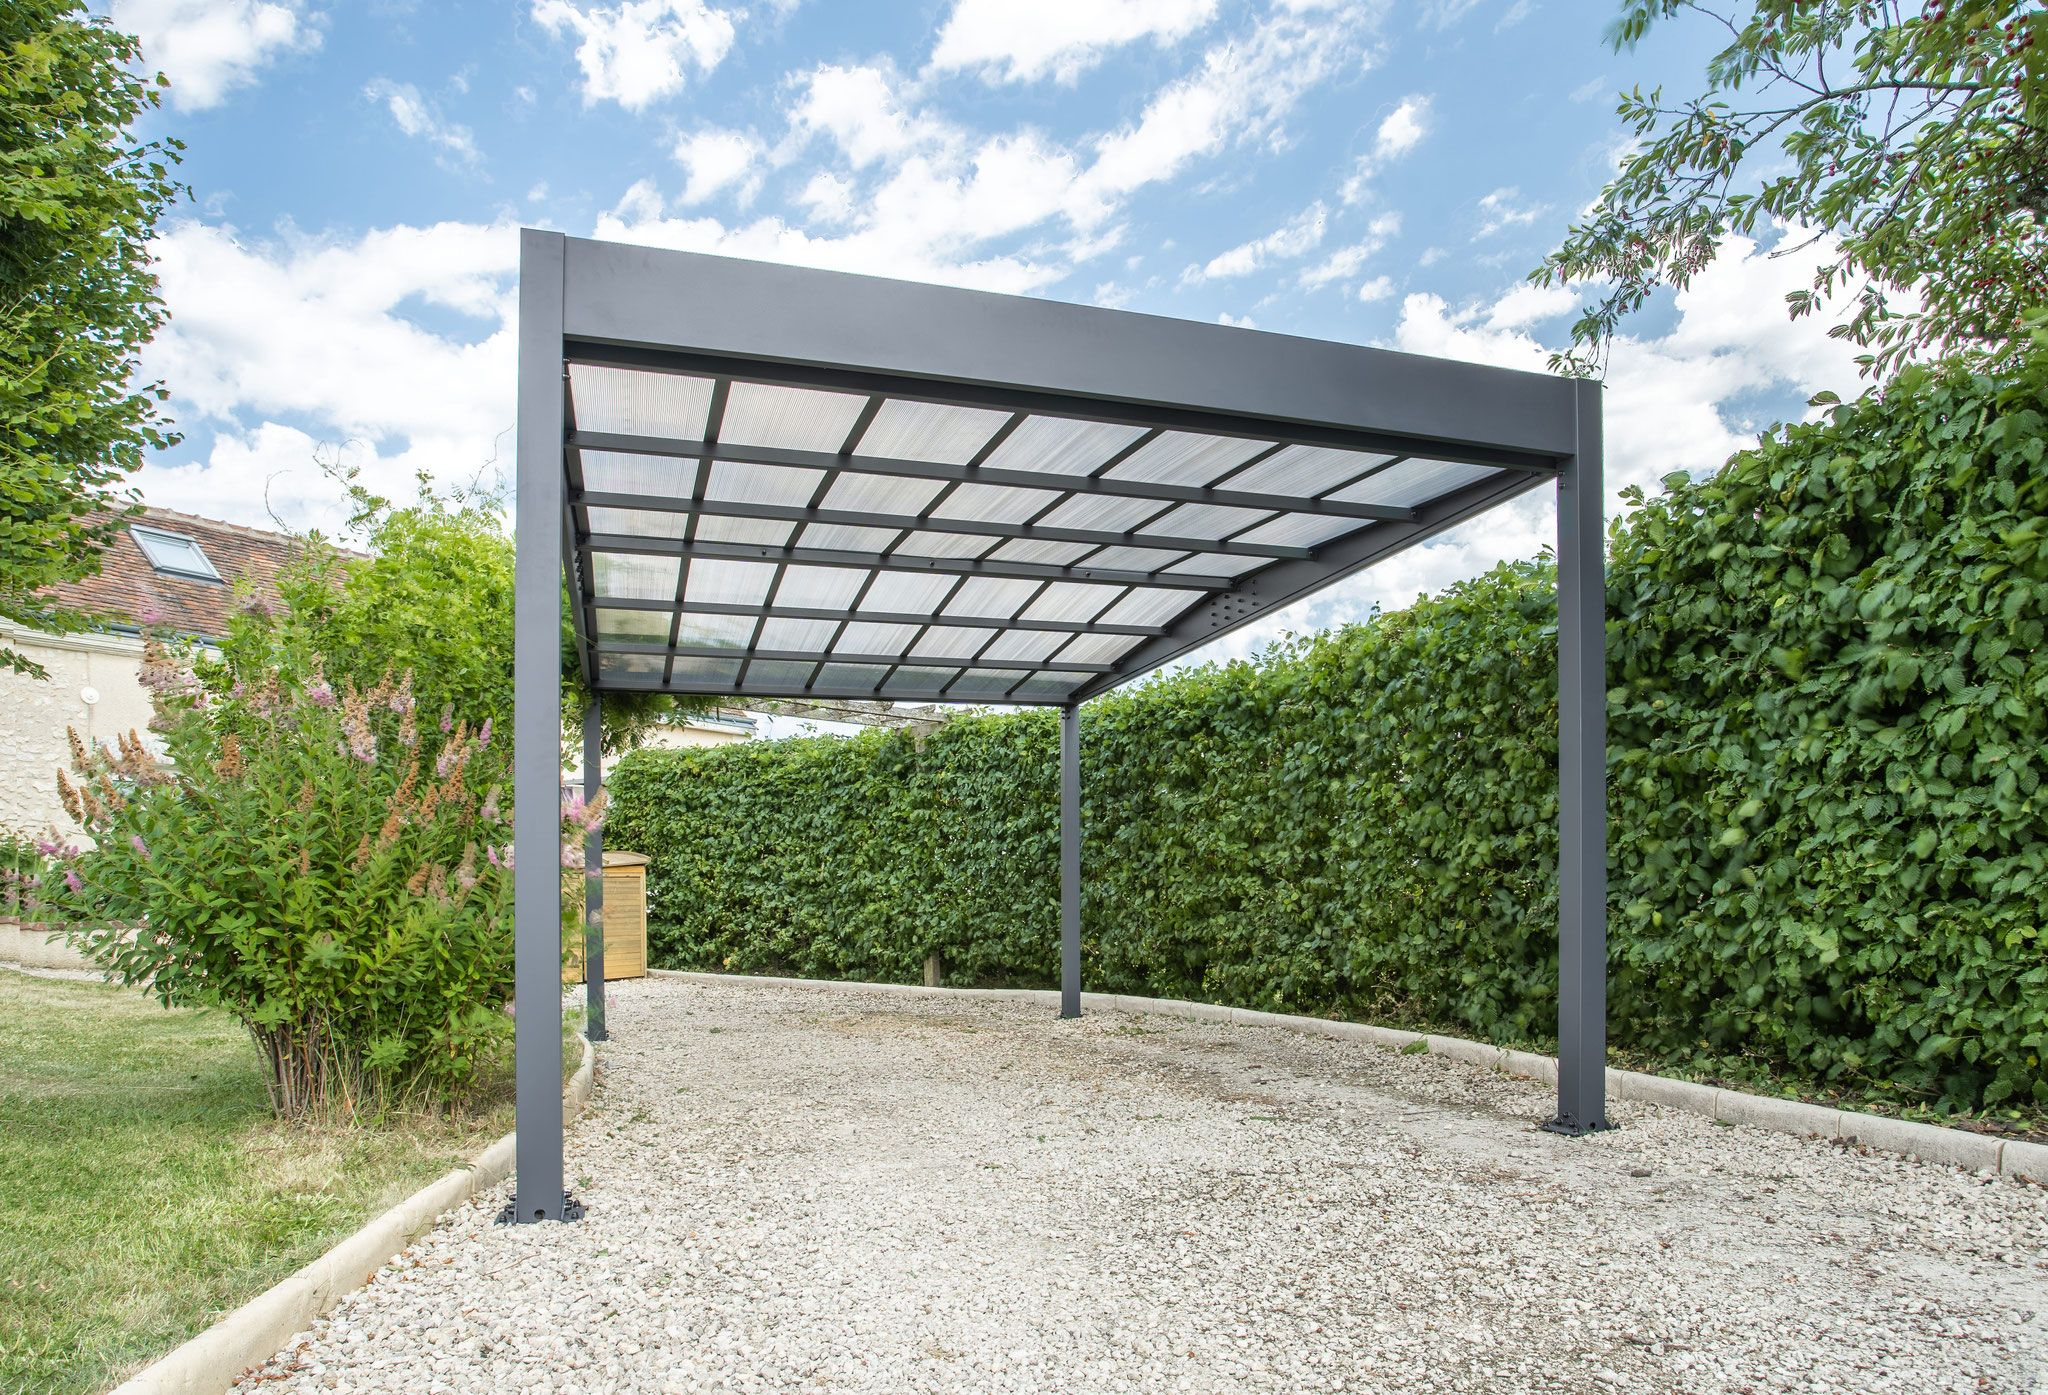 Carport Trigano Jardin Terrasse Jardin Equipement Exterieur Abri Voiture